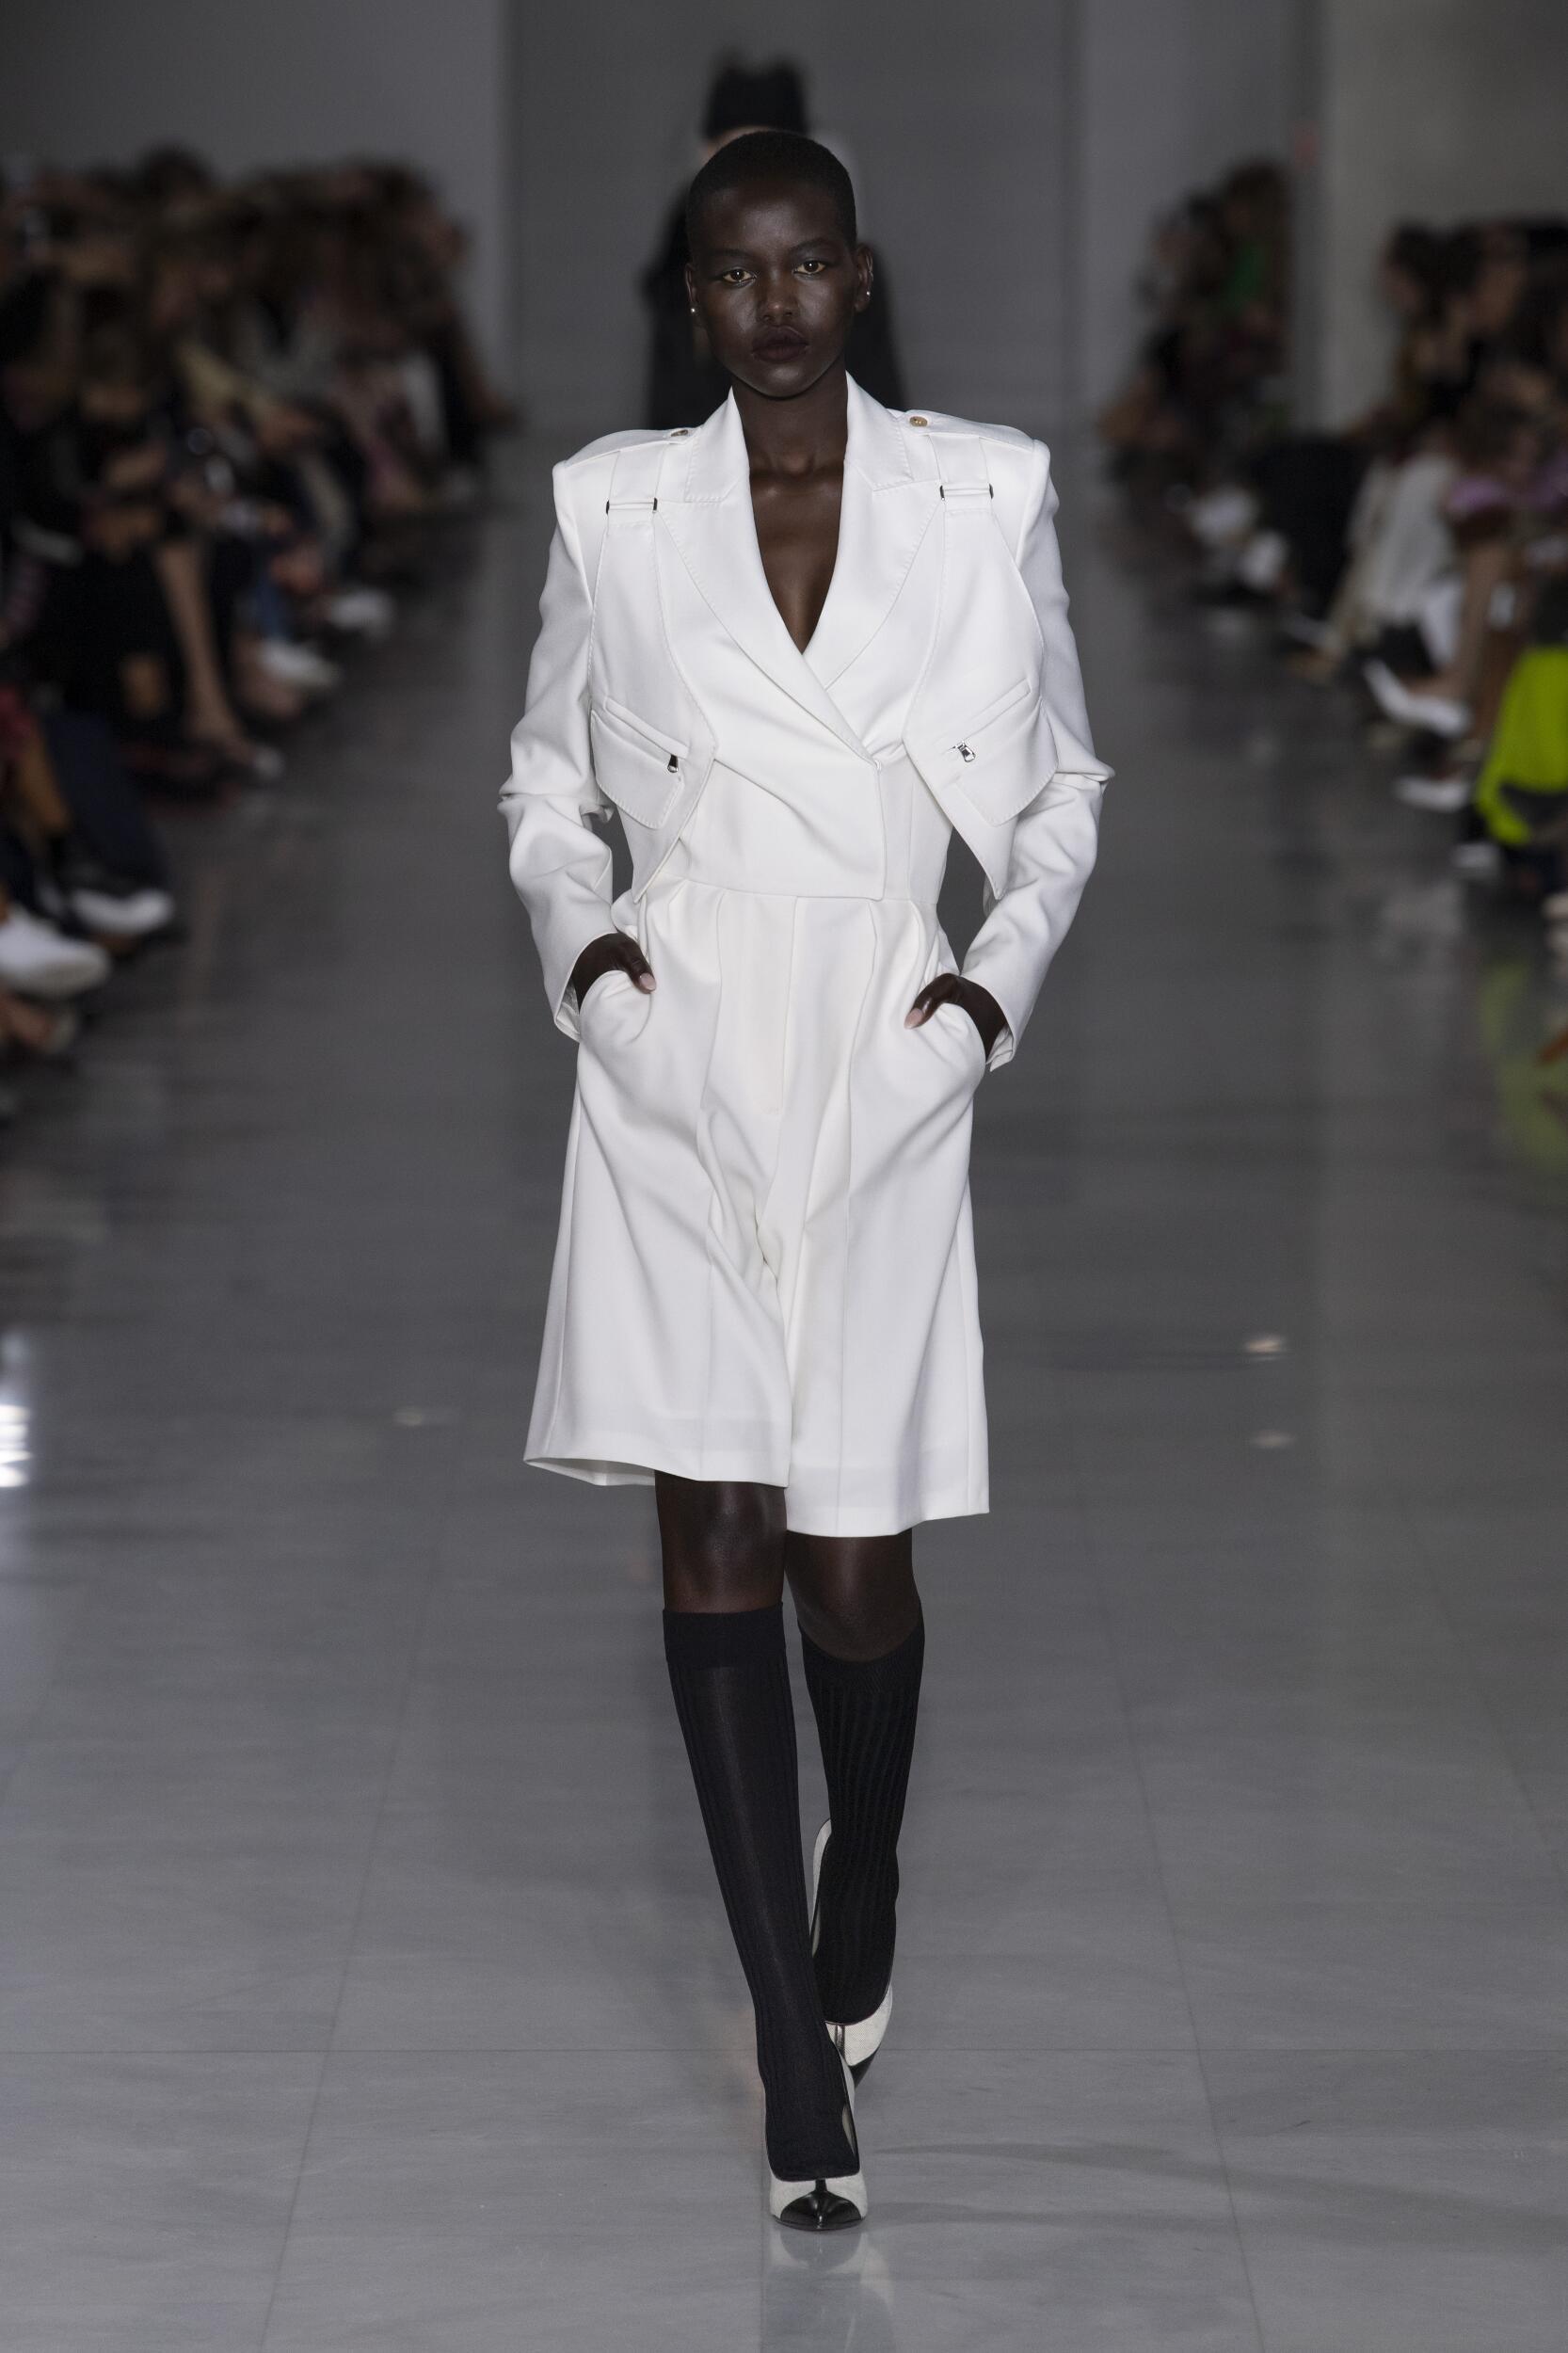 Spring Fashion Trends 2020 Max Mara